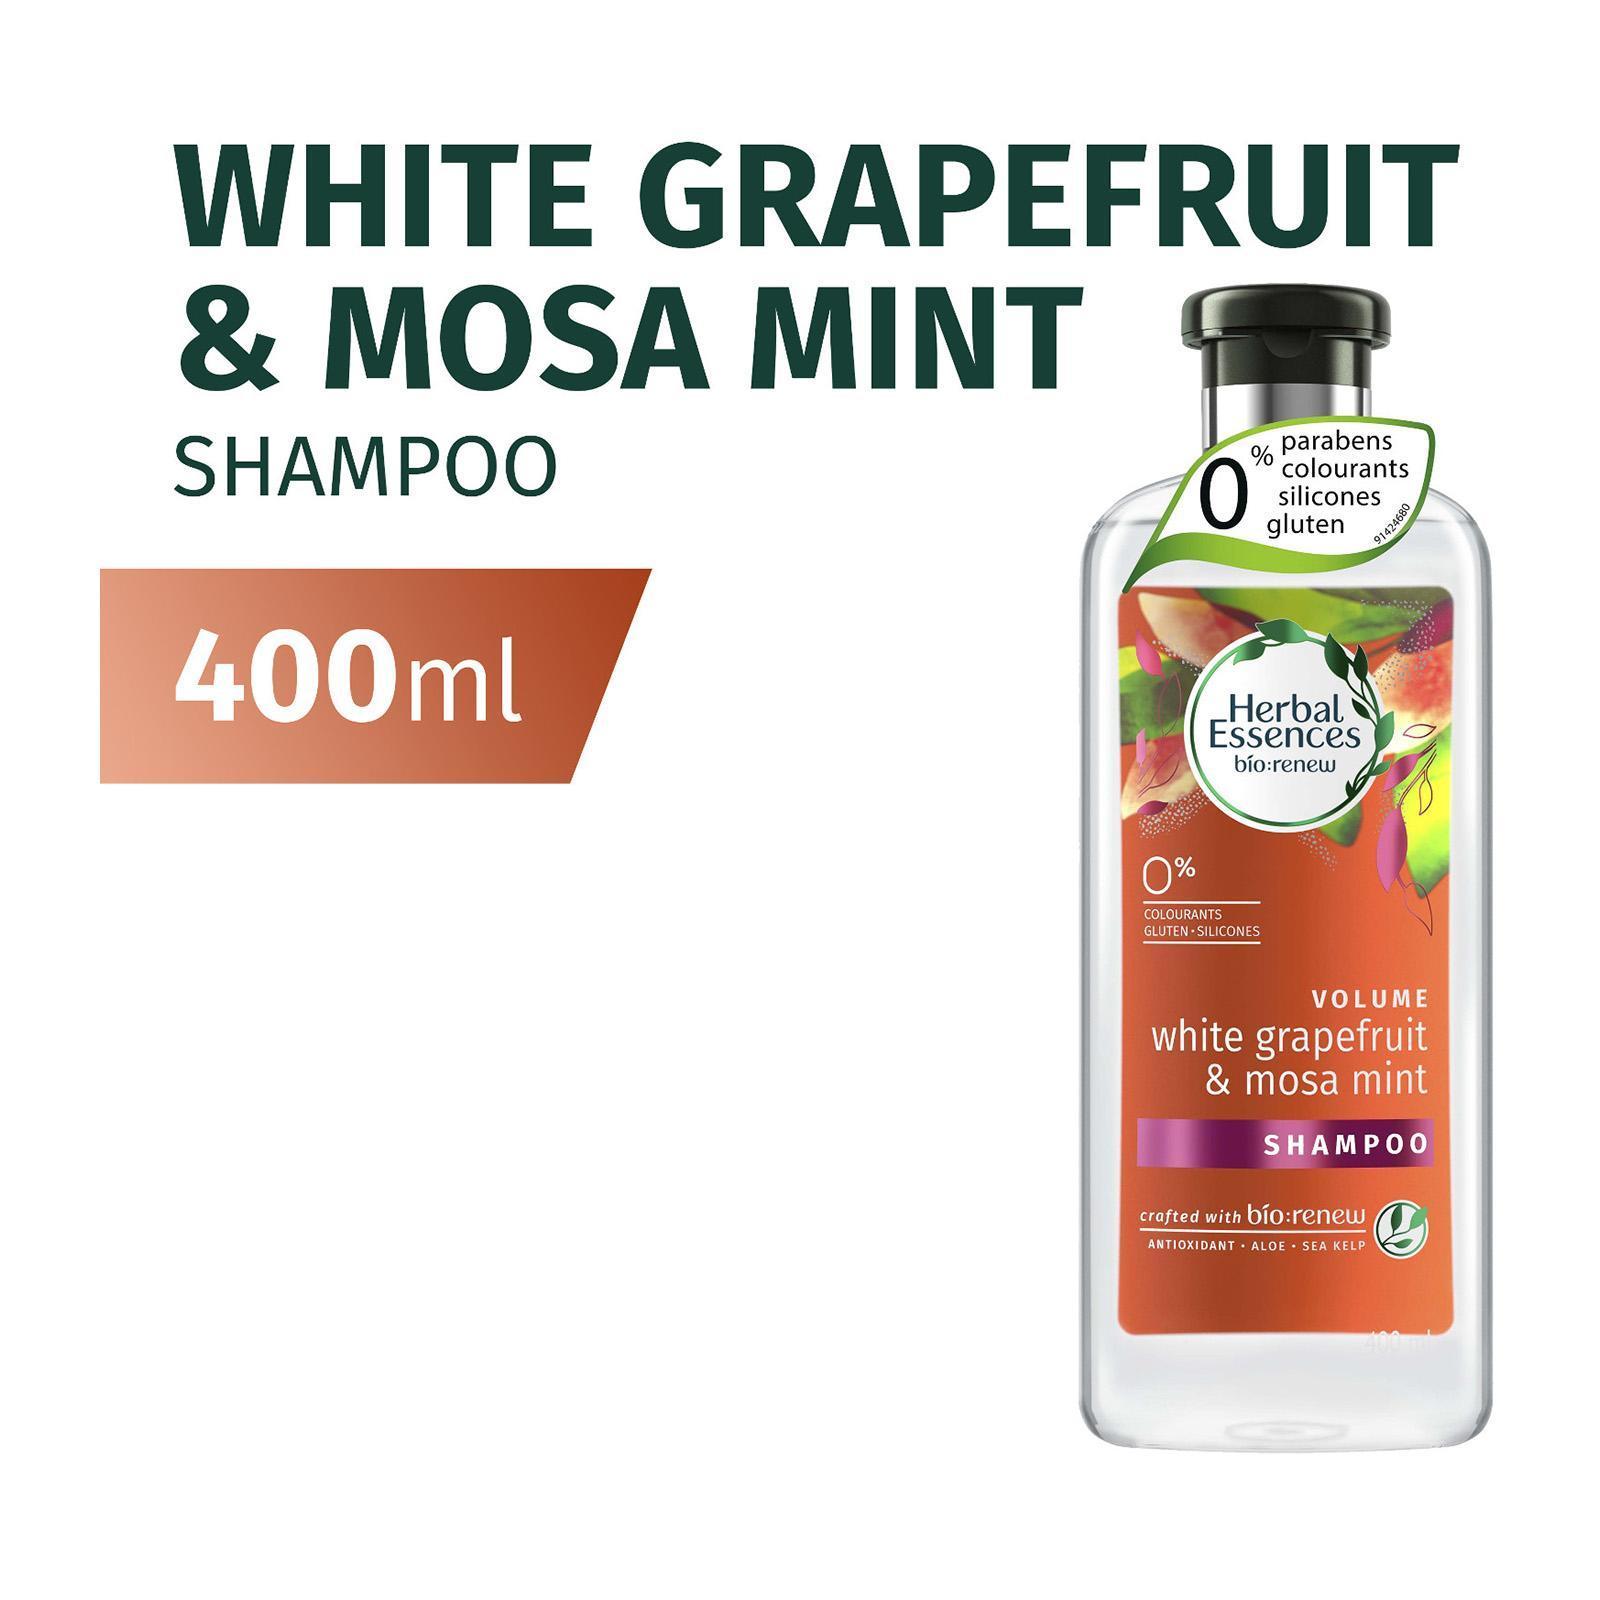 HERBAL ESSENCES herbal essences volume white grapefruit mosa mint shampoo 400ml